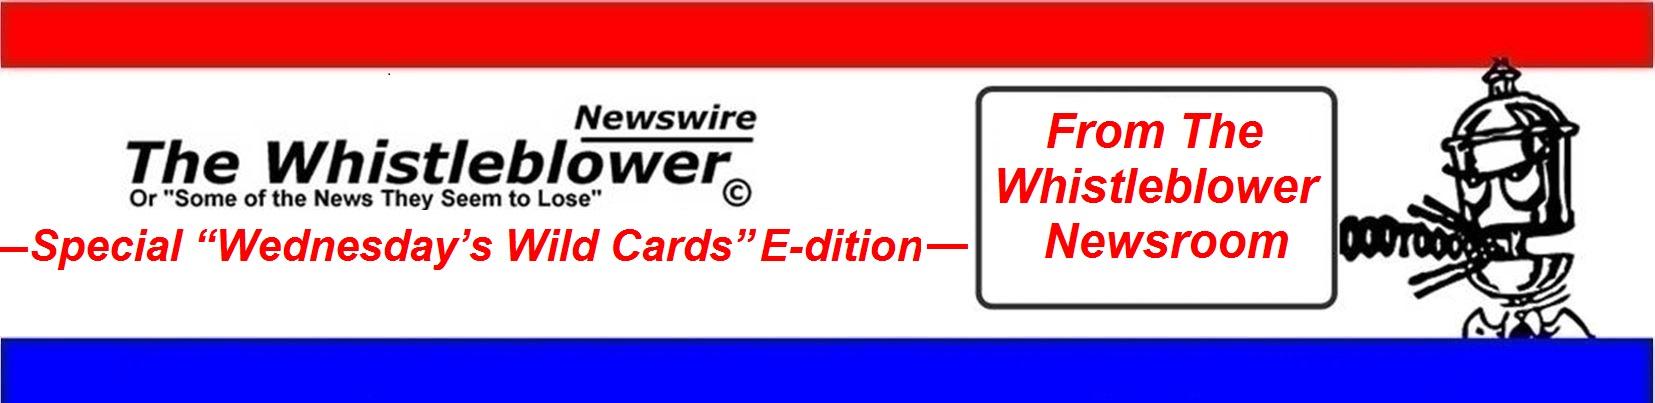 WEDNESDAY WILD CARDS